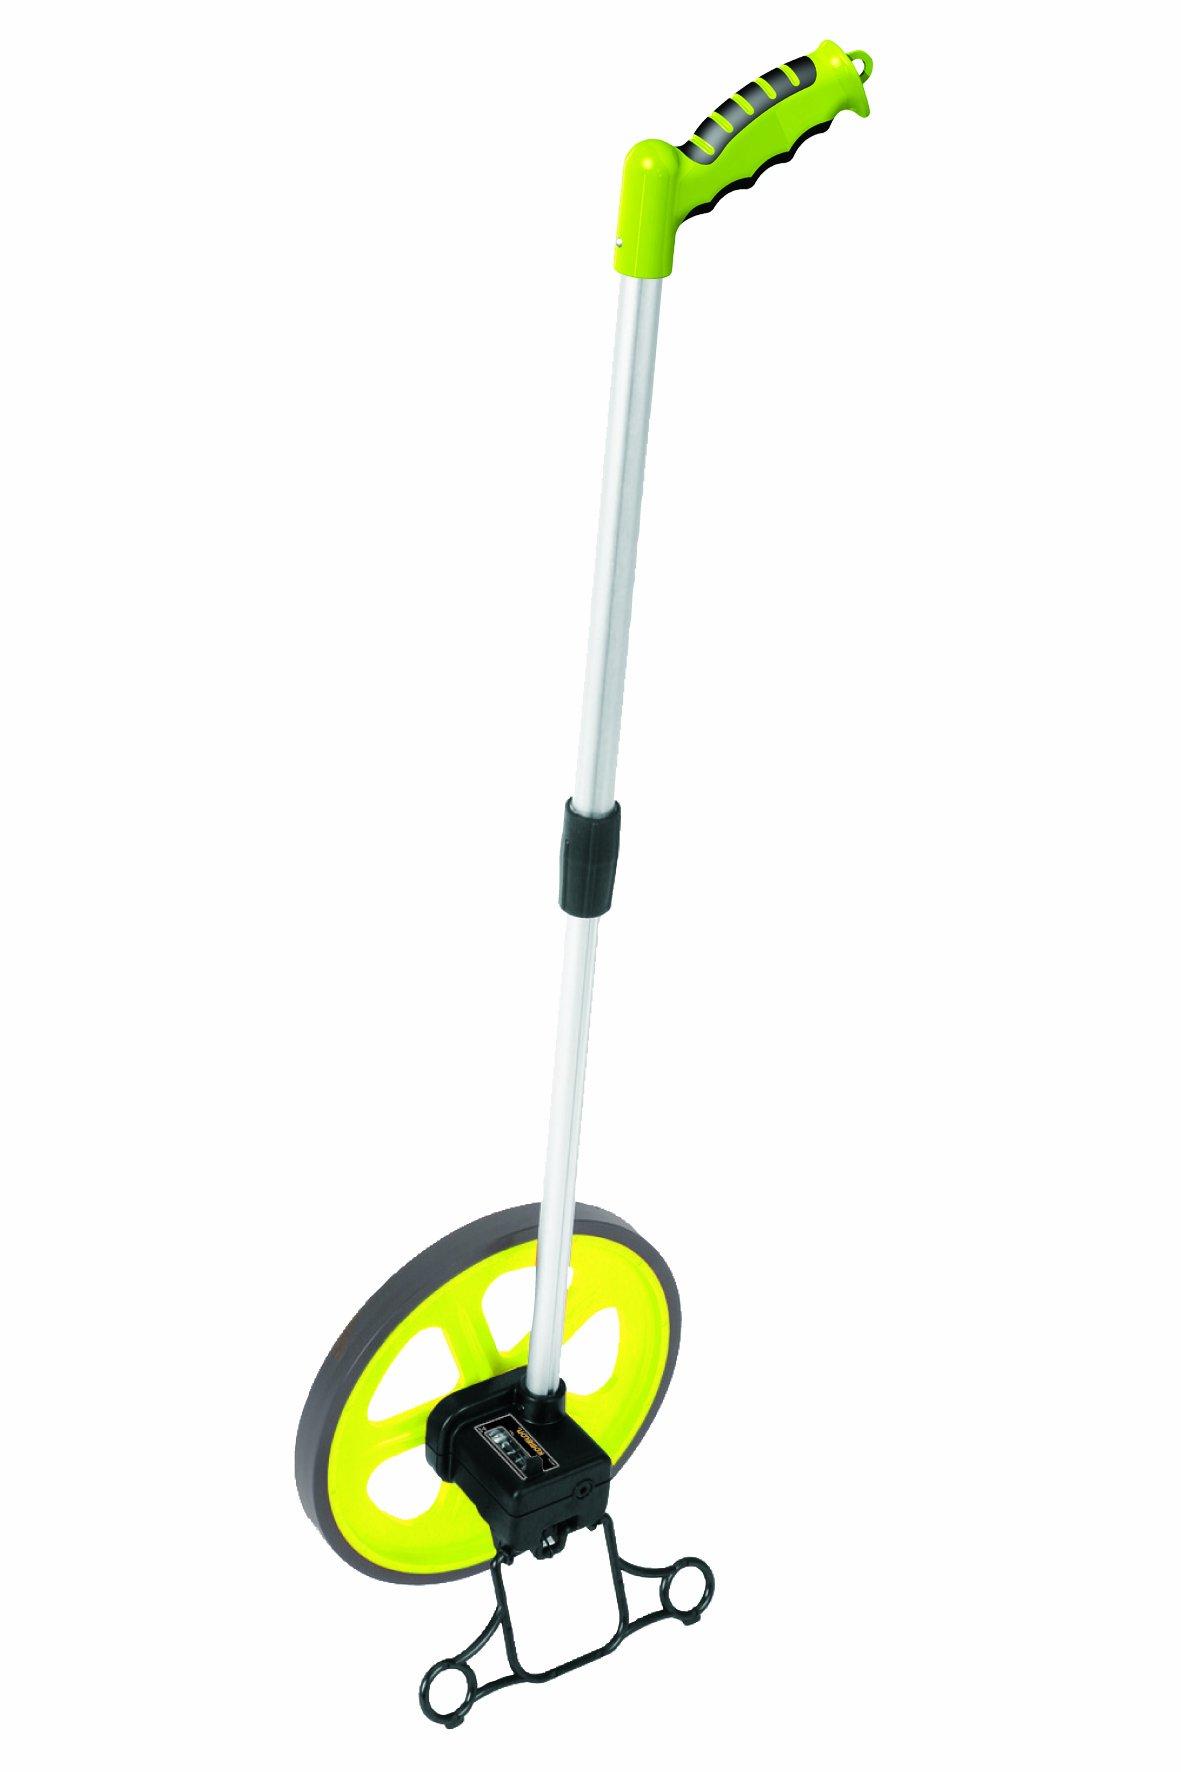 Komelon MK31M Meterman High-Viz Measuring Wheel Metric 10-Inch Diameter, Yellow